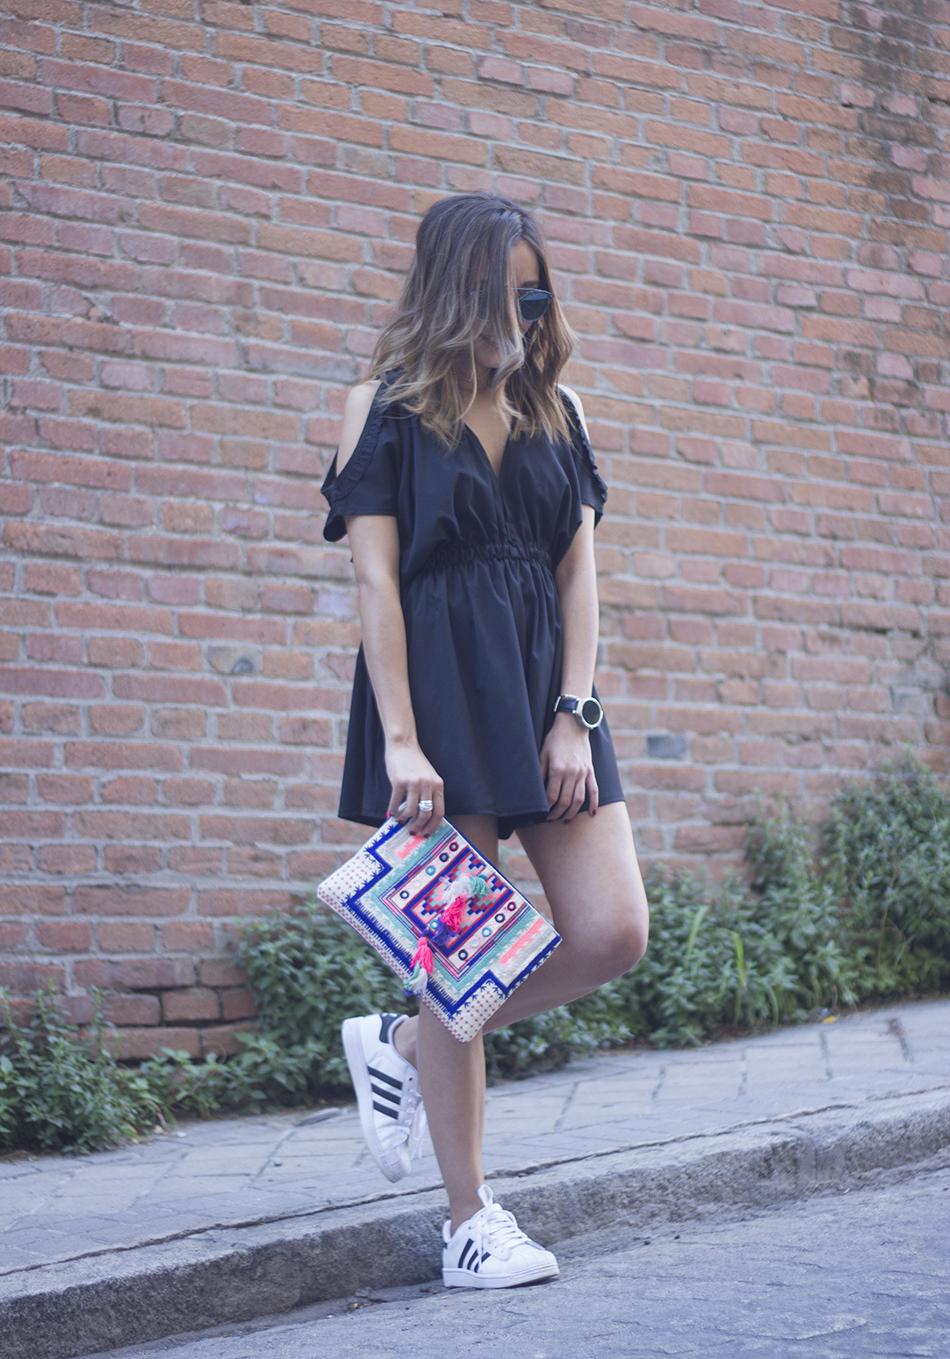 Black Jumpsuit With Adidas SuperStar03